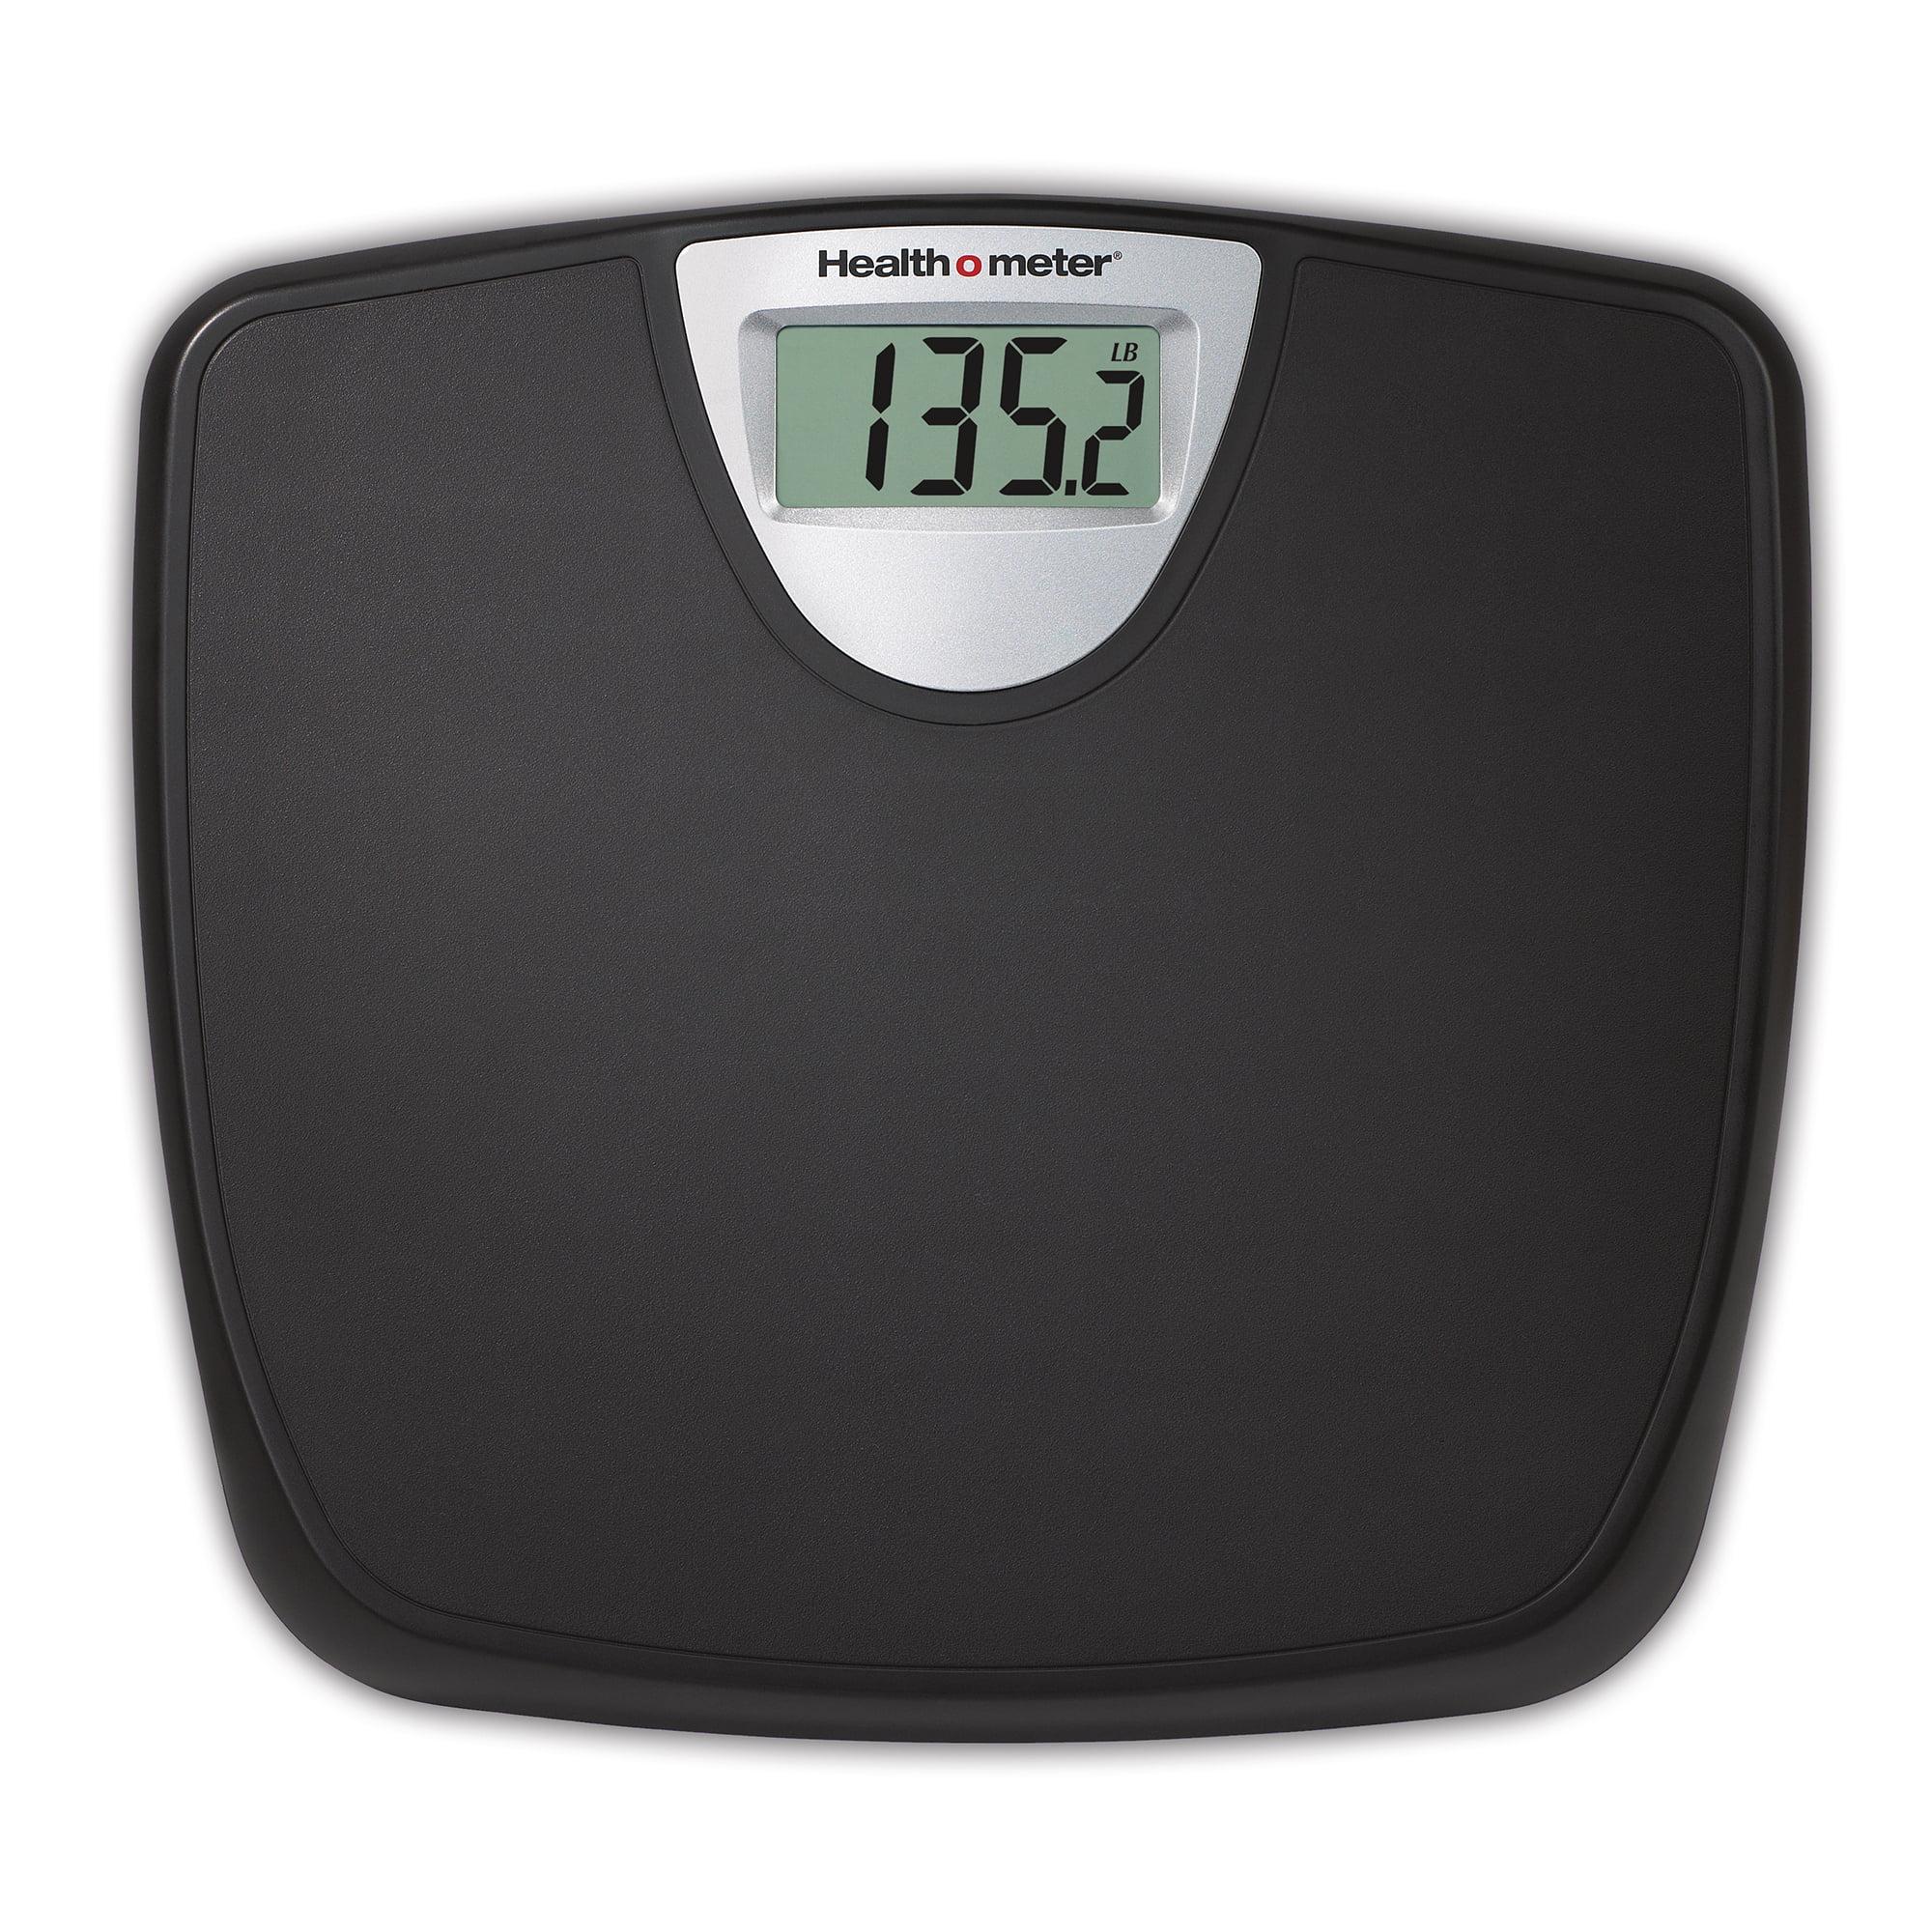 Health o meter Weight Tracking Digital Scale  Walmartcom